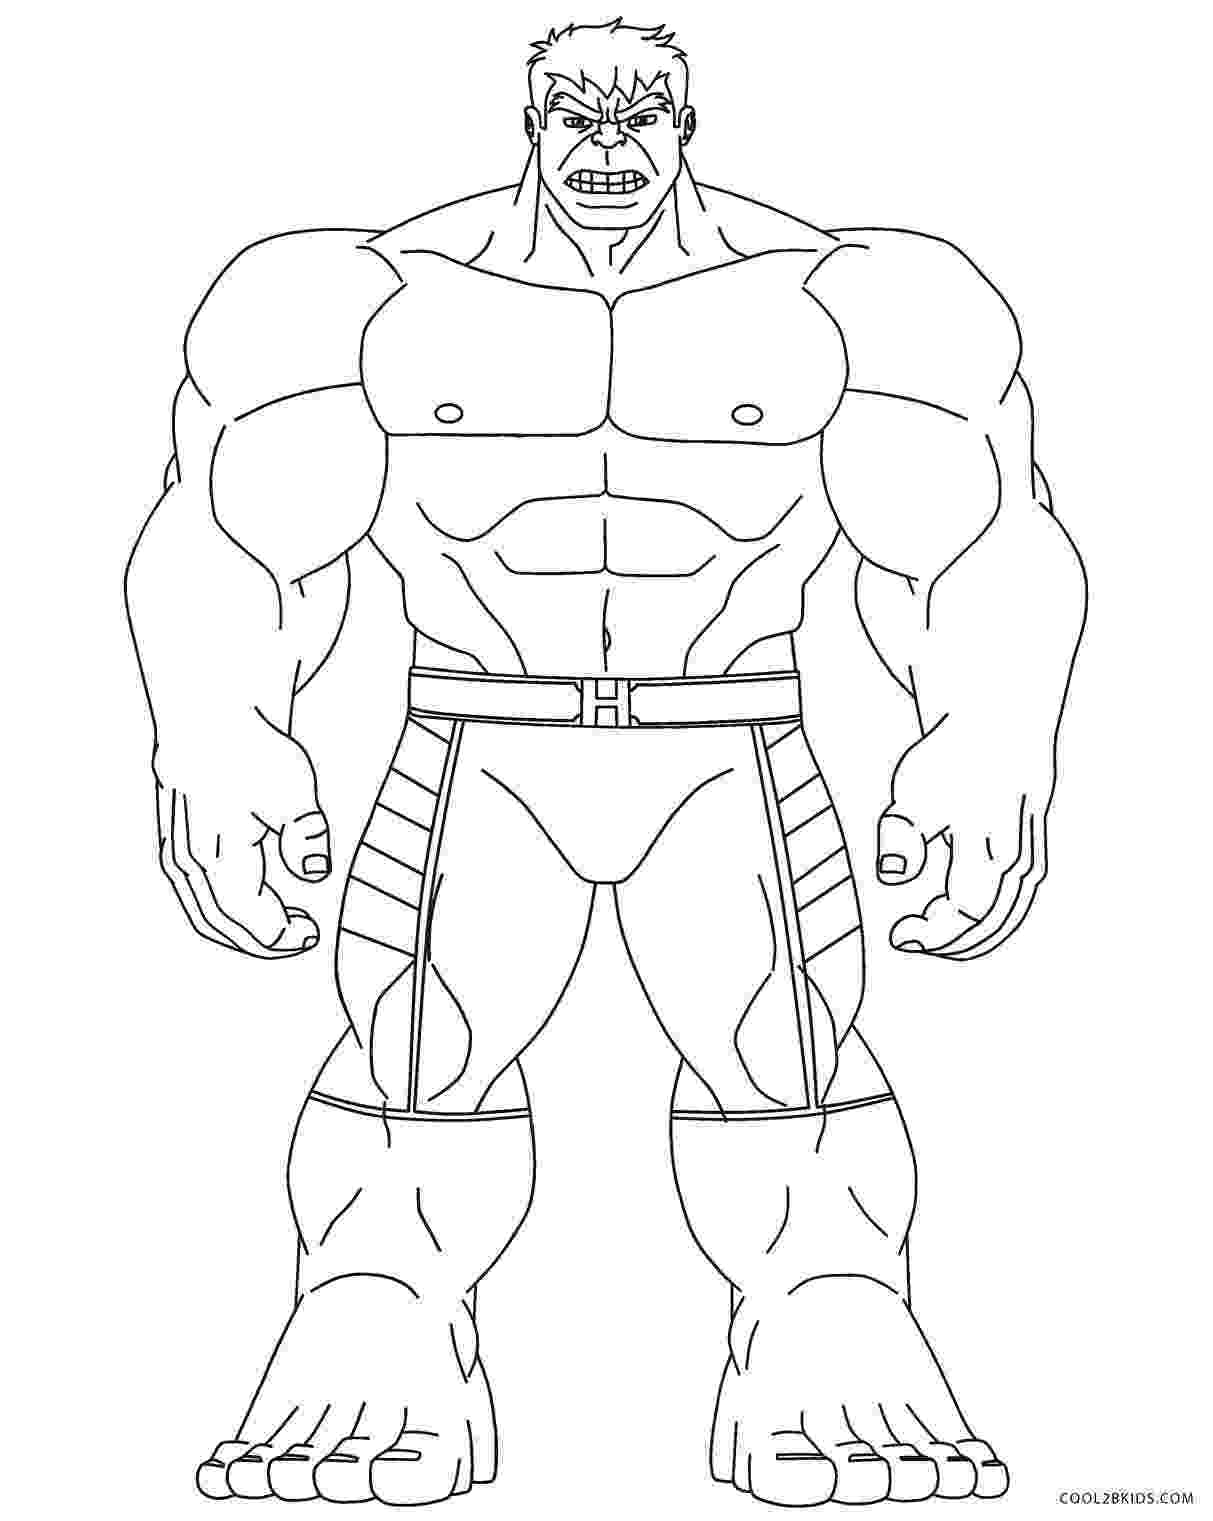 hulk coloring book free printable hulk coloring pages for kids cool2bkids book coloring hulk